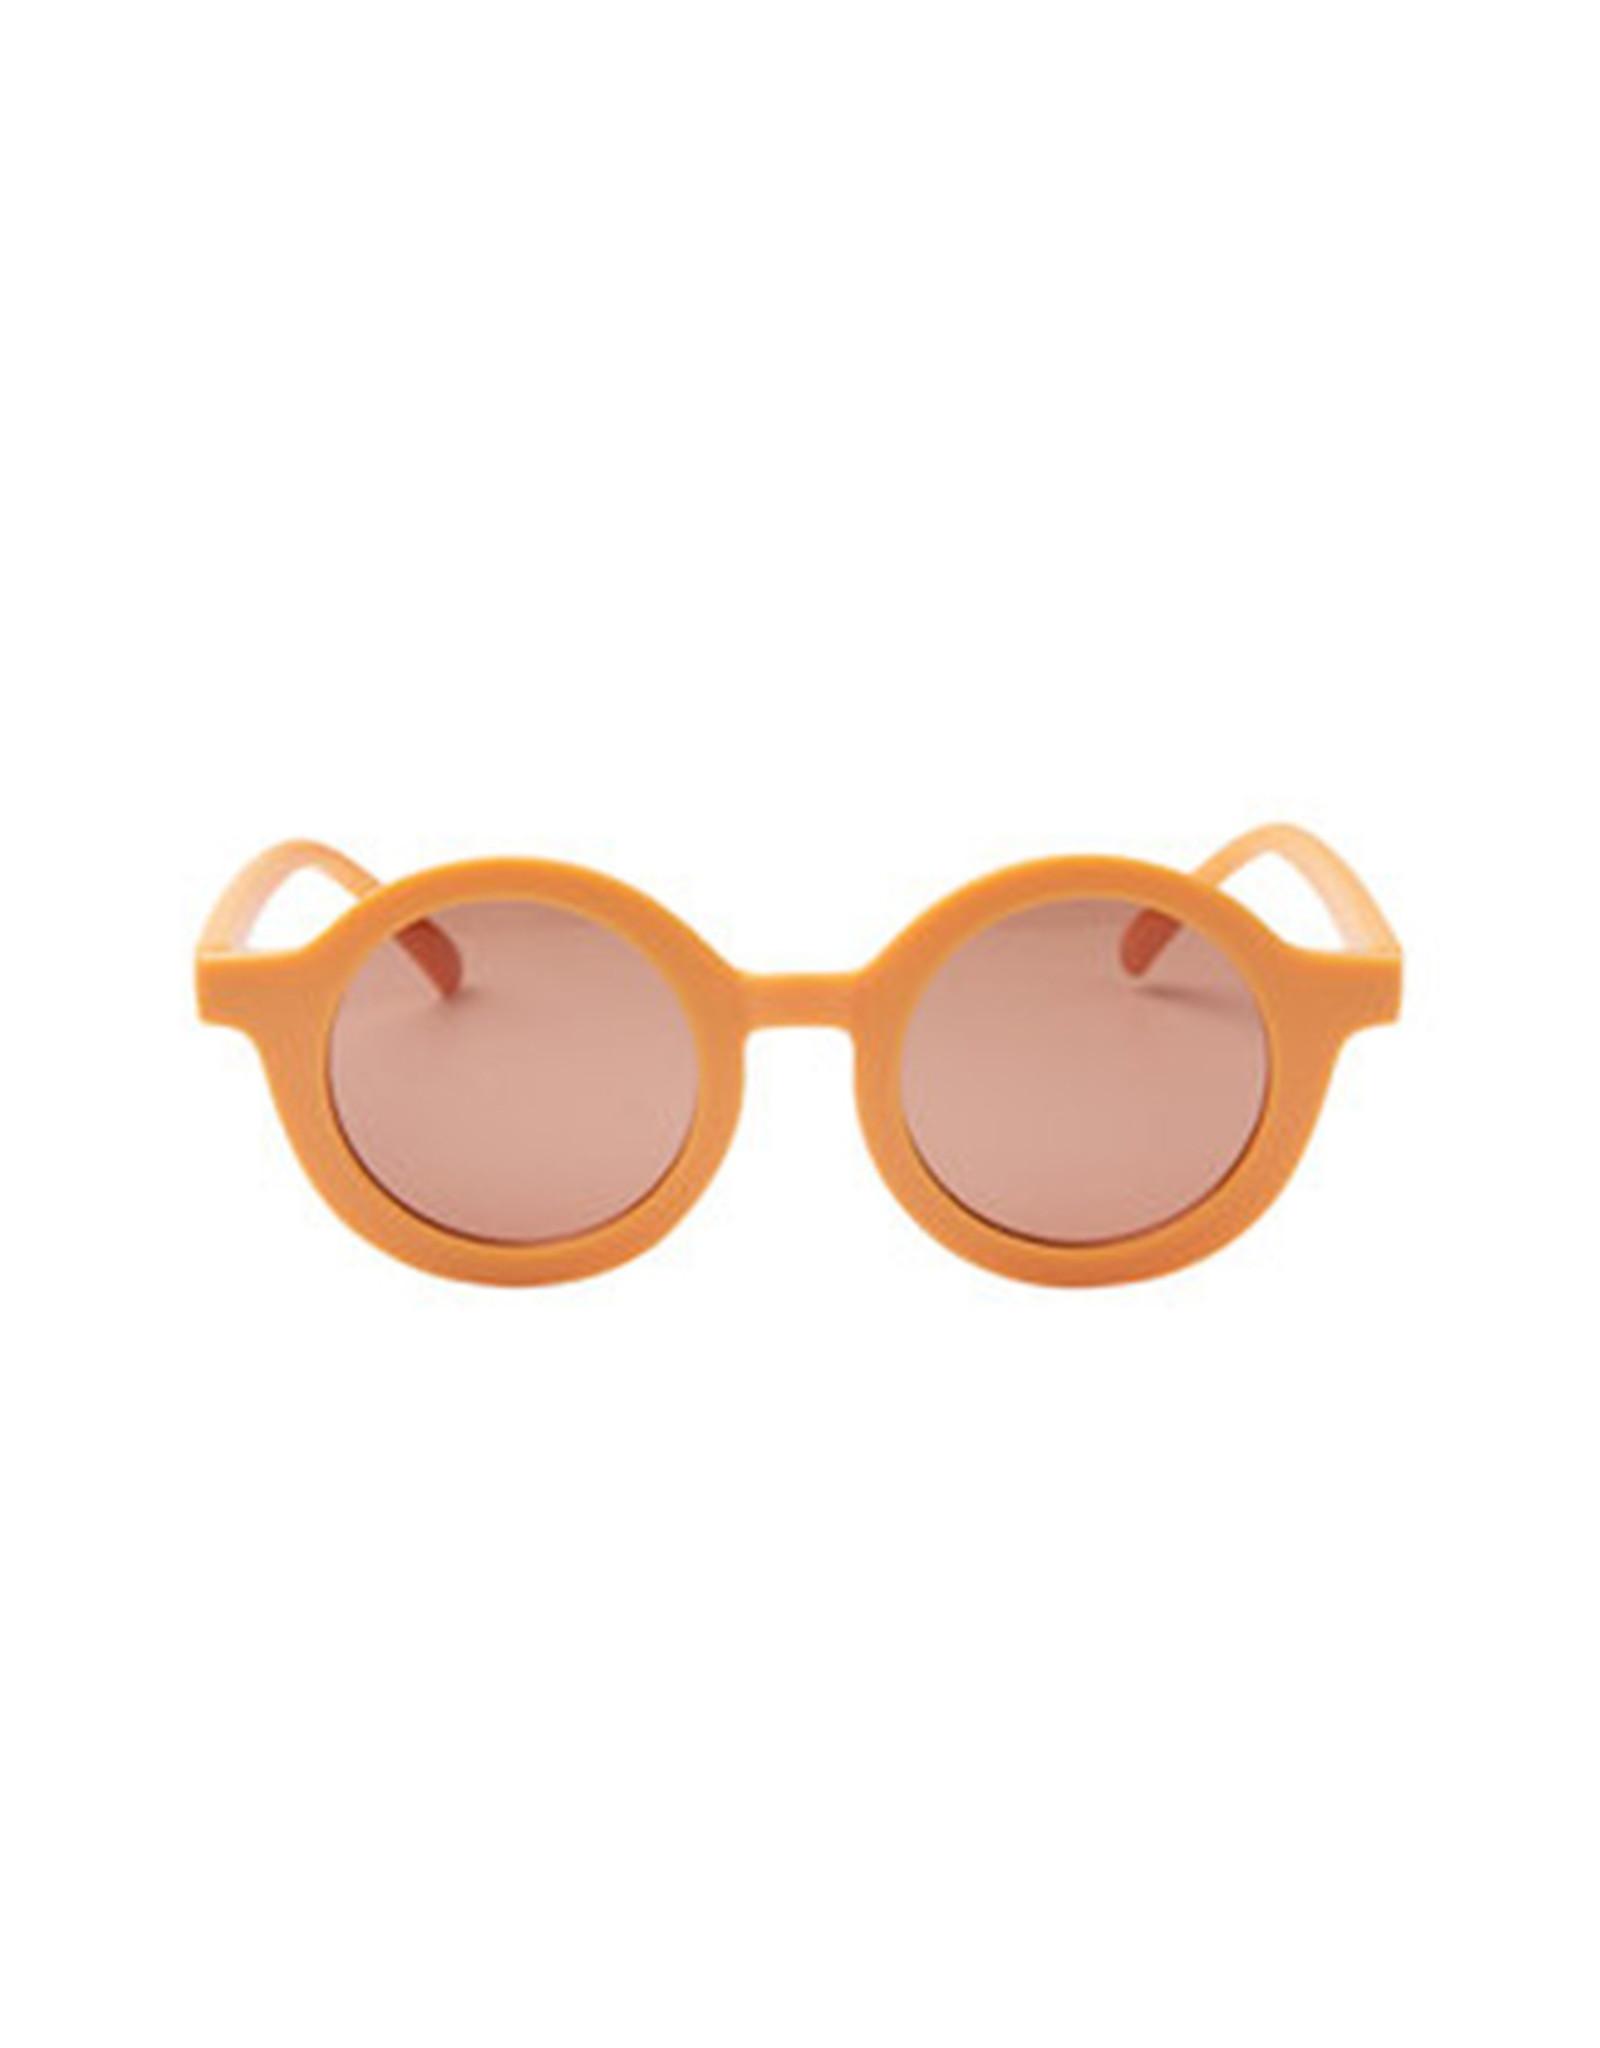 Sunglasses Oker